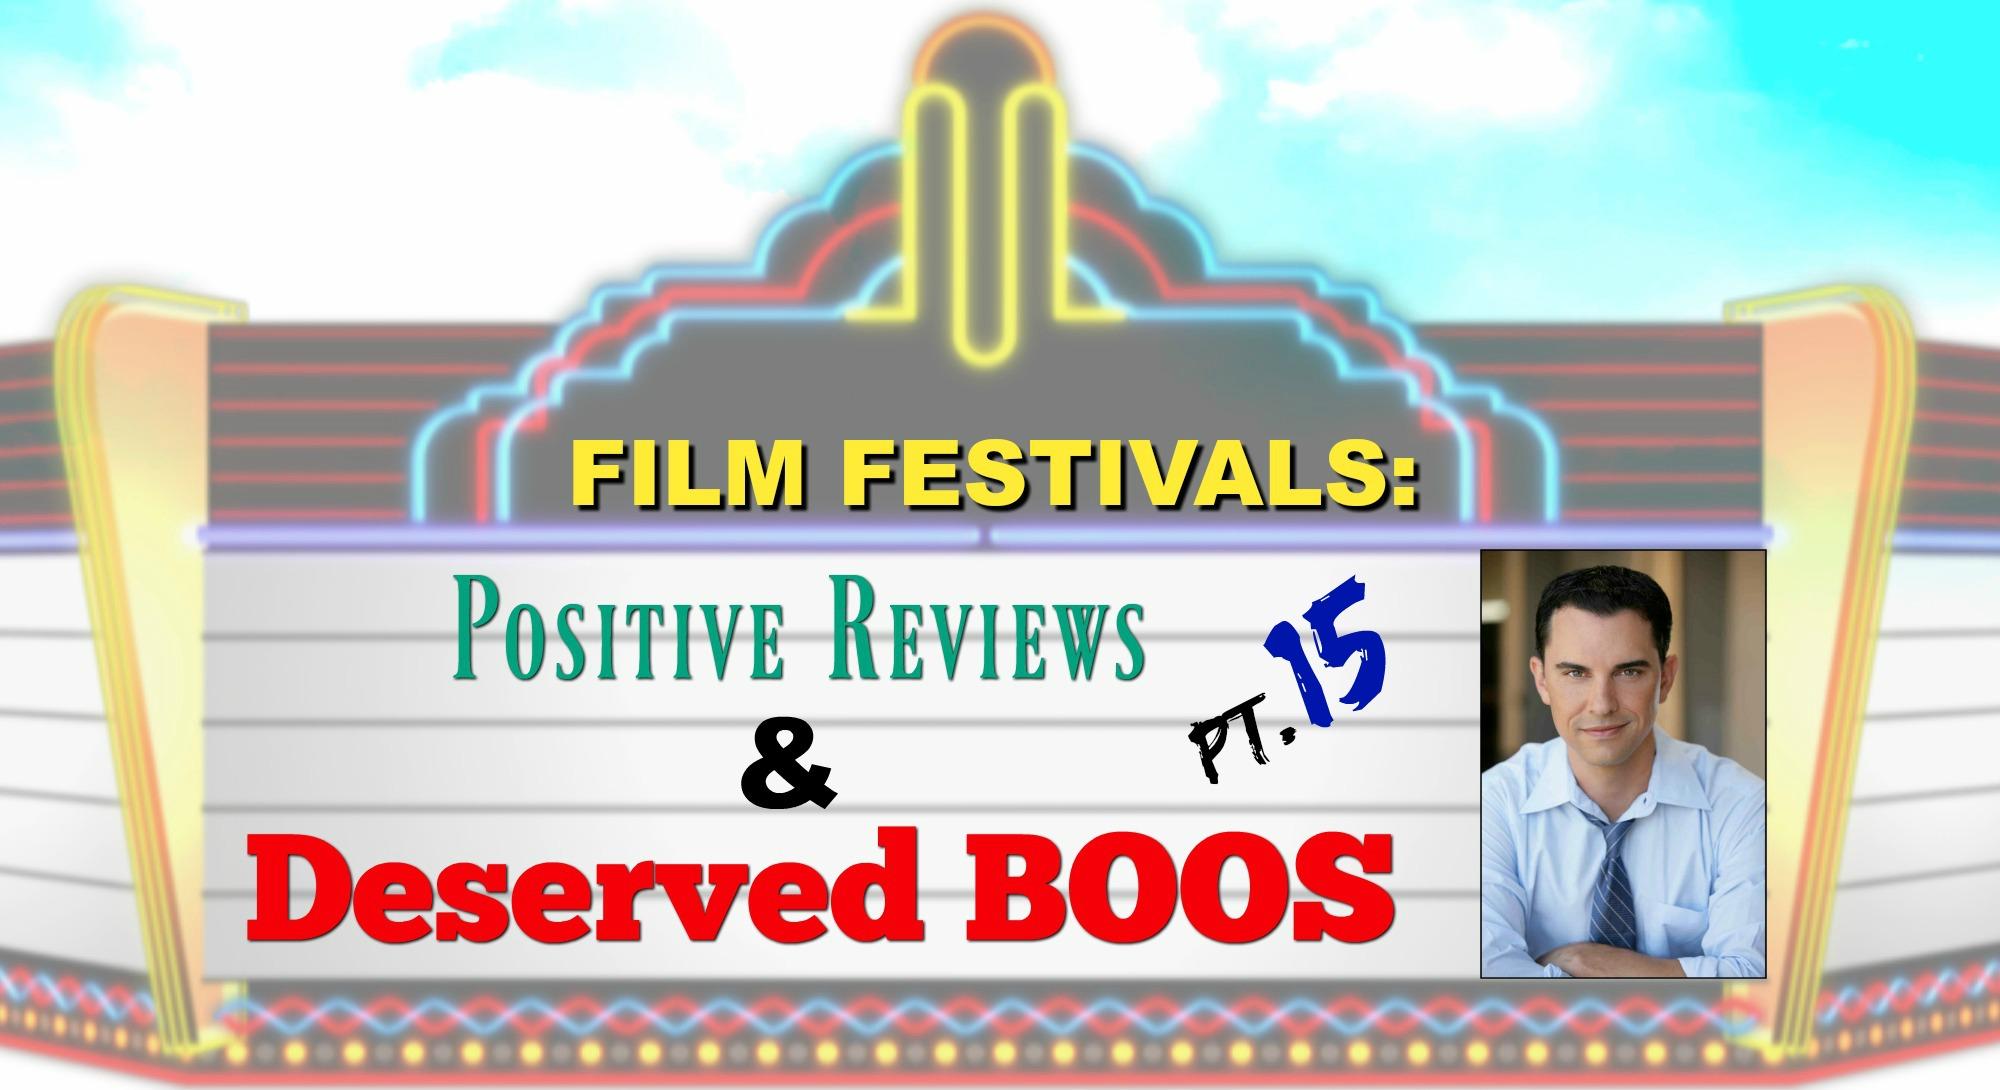 International cinema clips website 01 11 - Film Festivals Positive Reviews Deserved Boos Pt 15 Int L Filmmaker Festival Of World Cinema Maryland Int L Film Festival